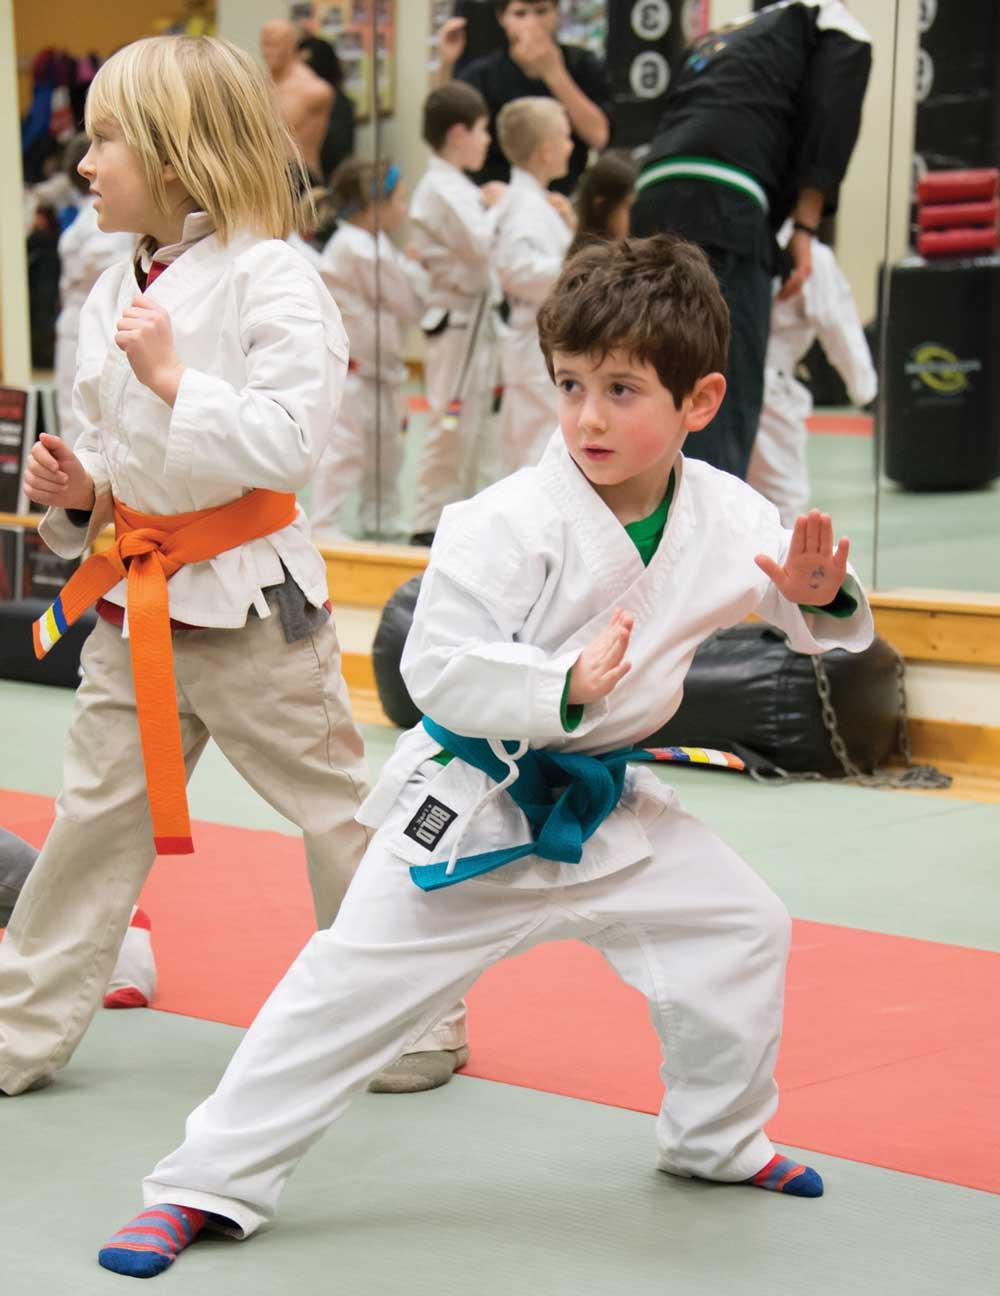 Ninja students improve their posture